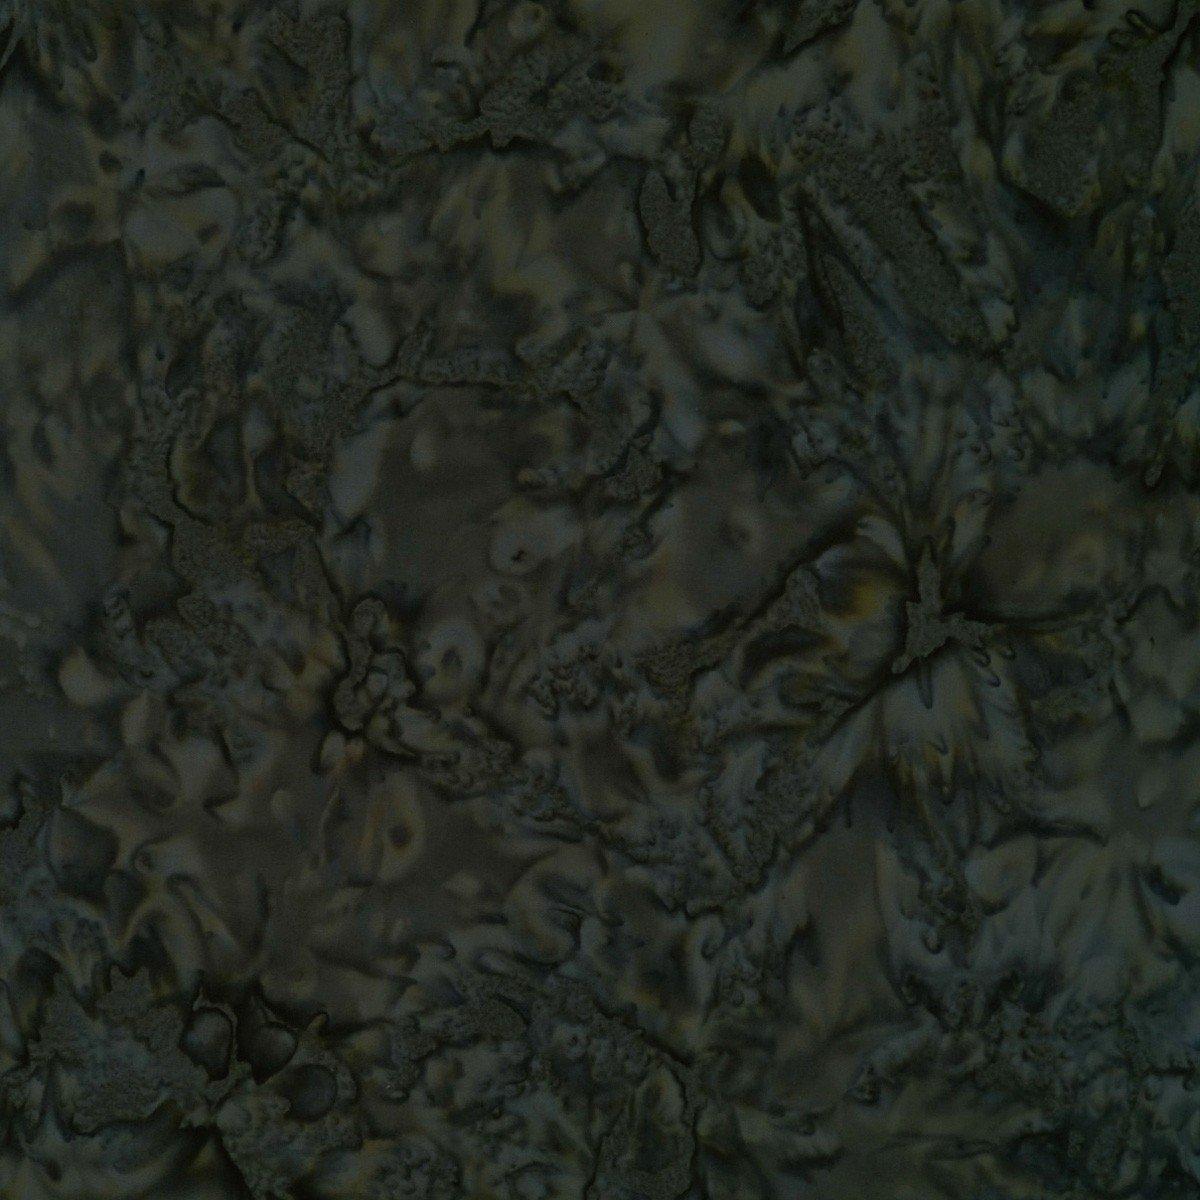 Batik by Mirah - terracotta - greenish/gray